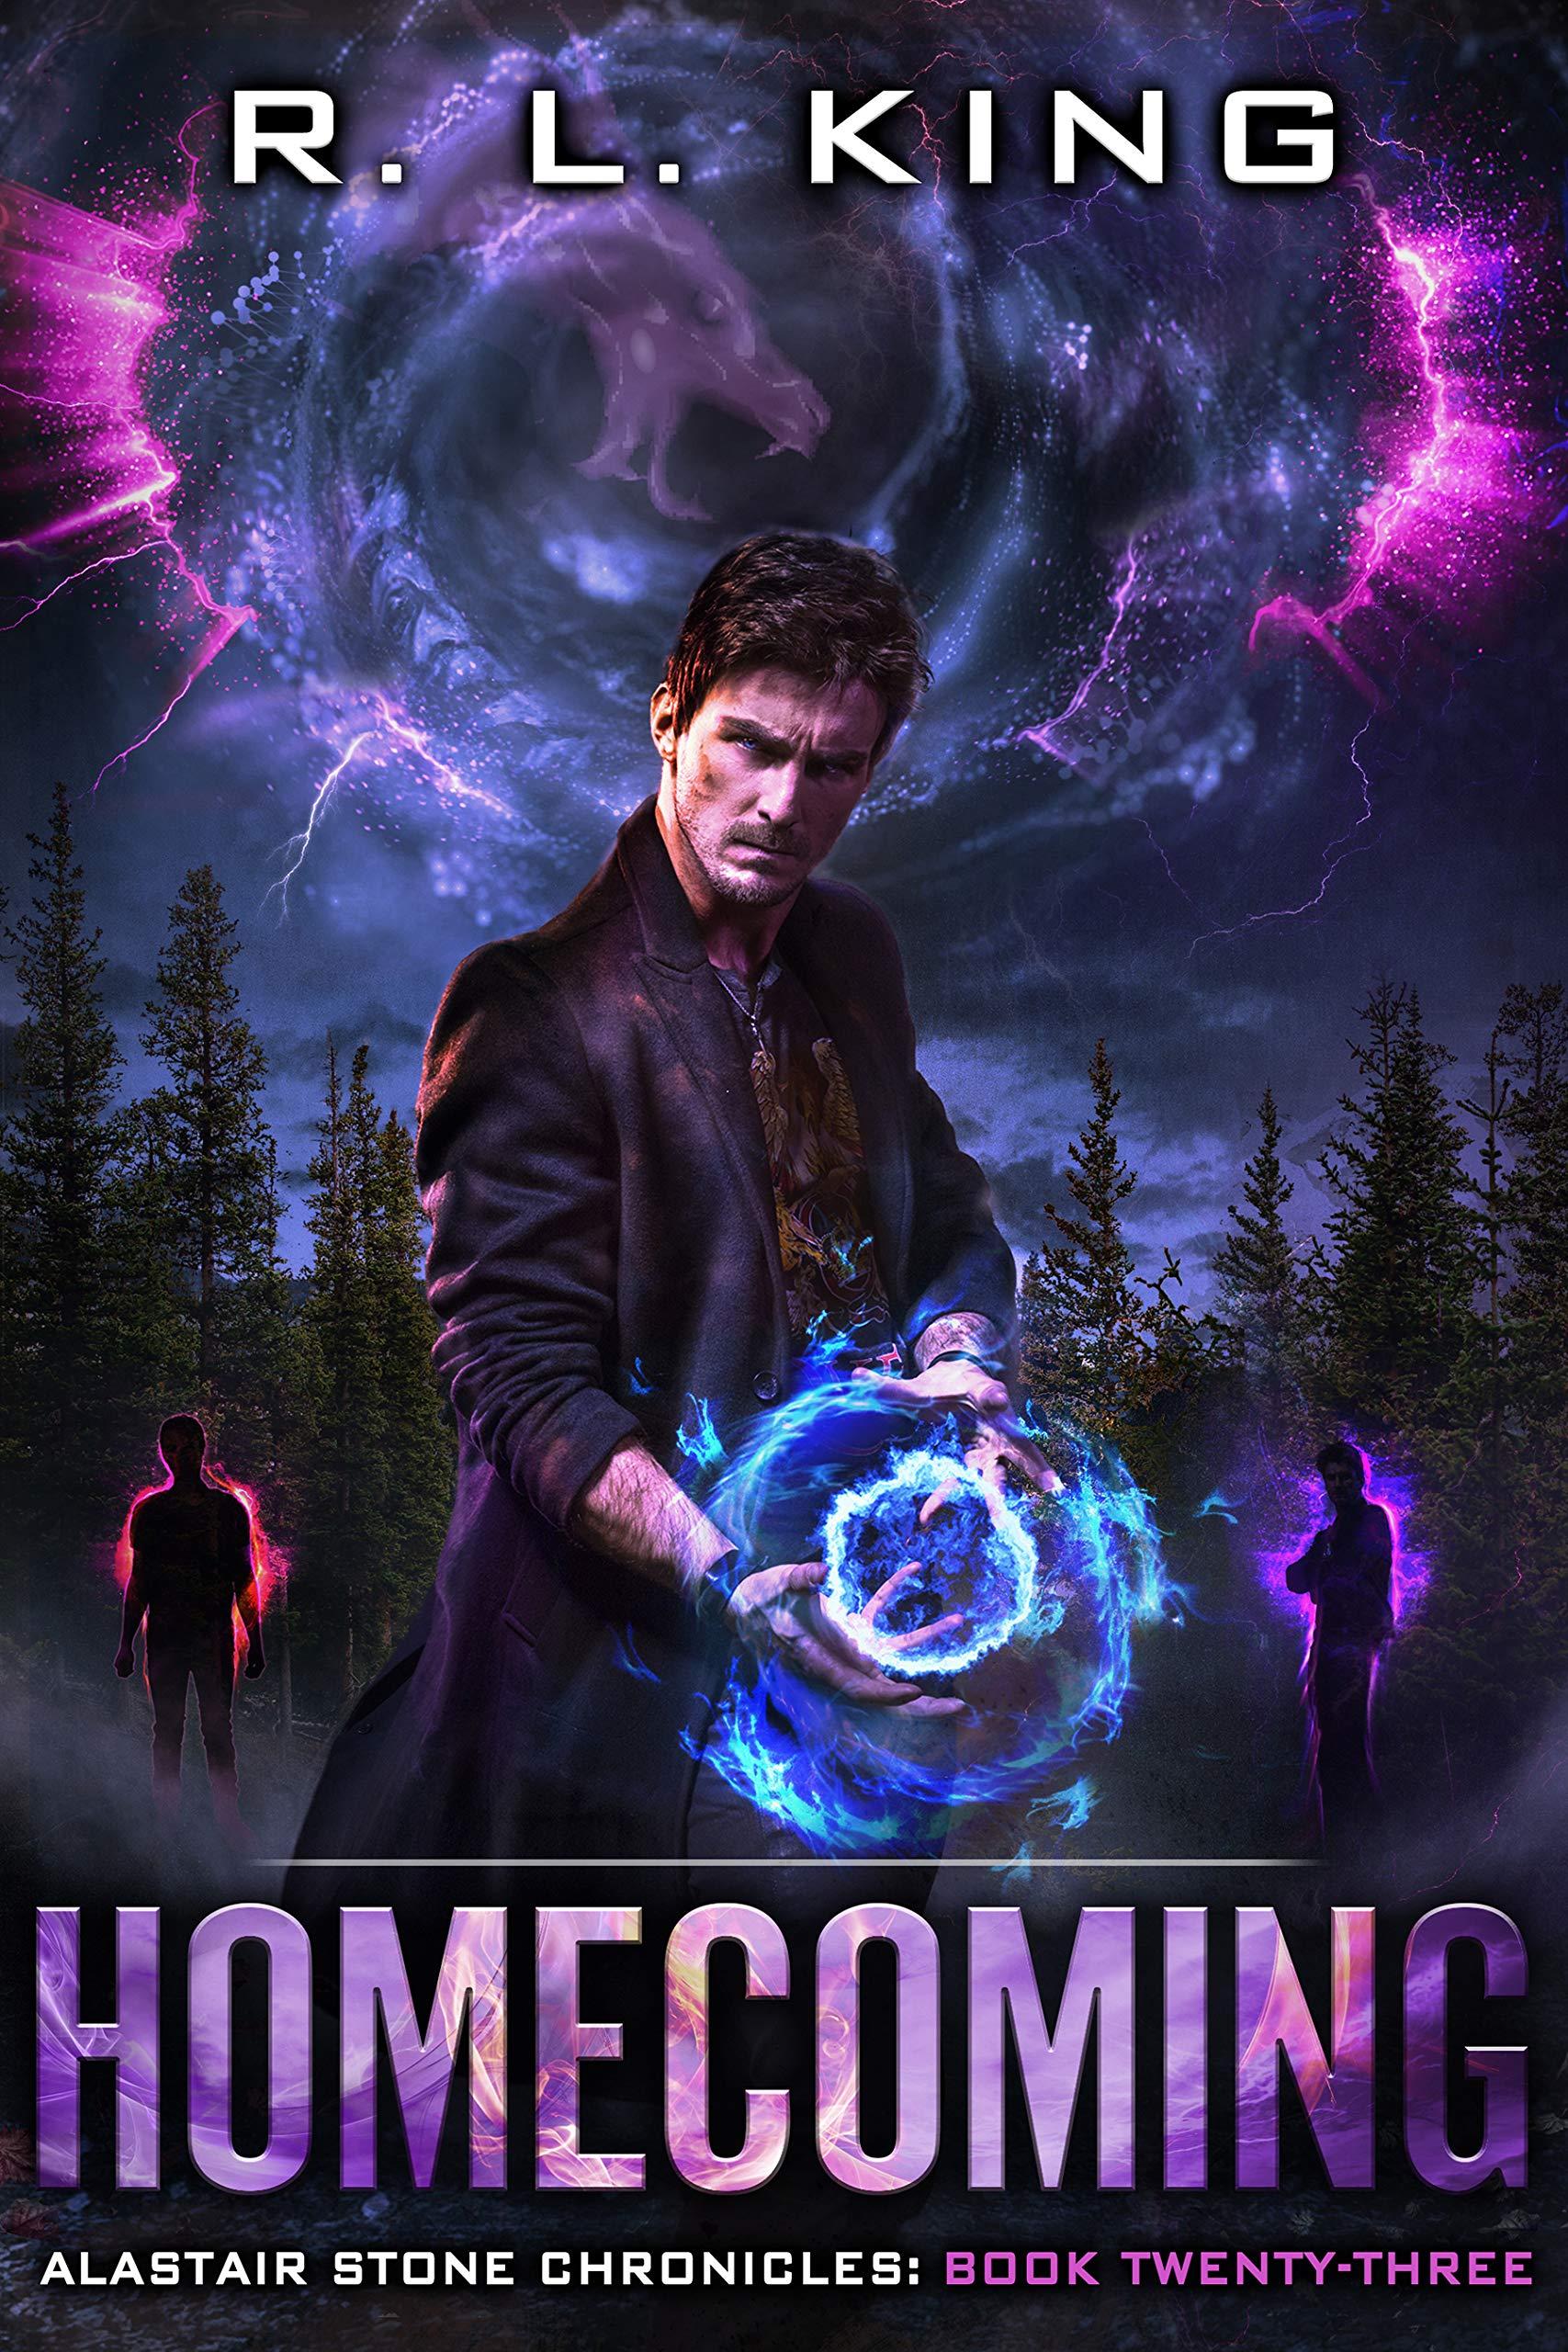 Homecoming: An Alastair Stone Urban Fantasy Novel (Alastair Stone Chronicles Book 23) (The Alastair Stone Chronicles)